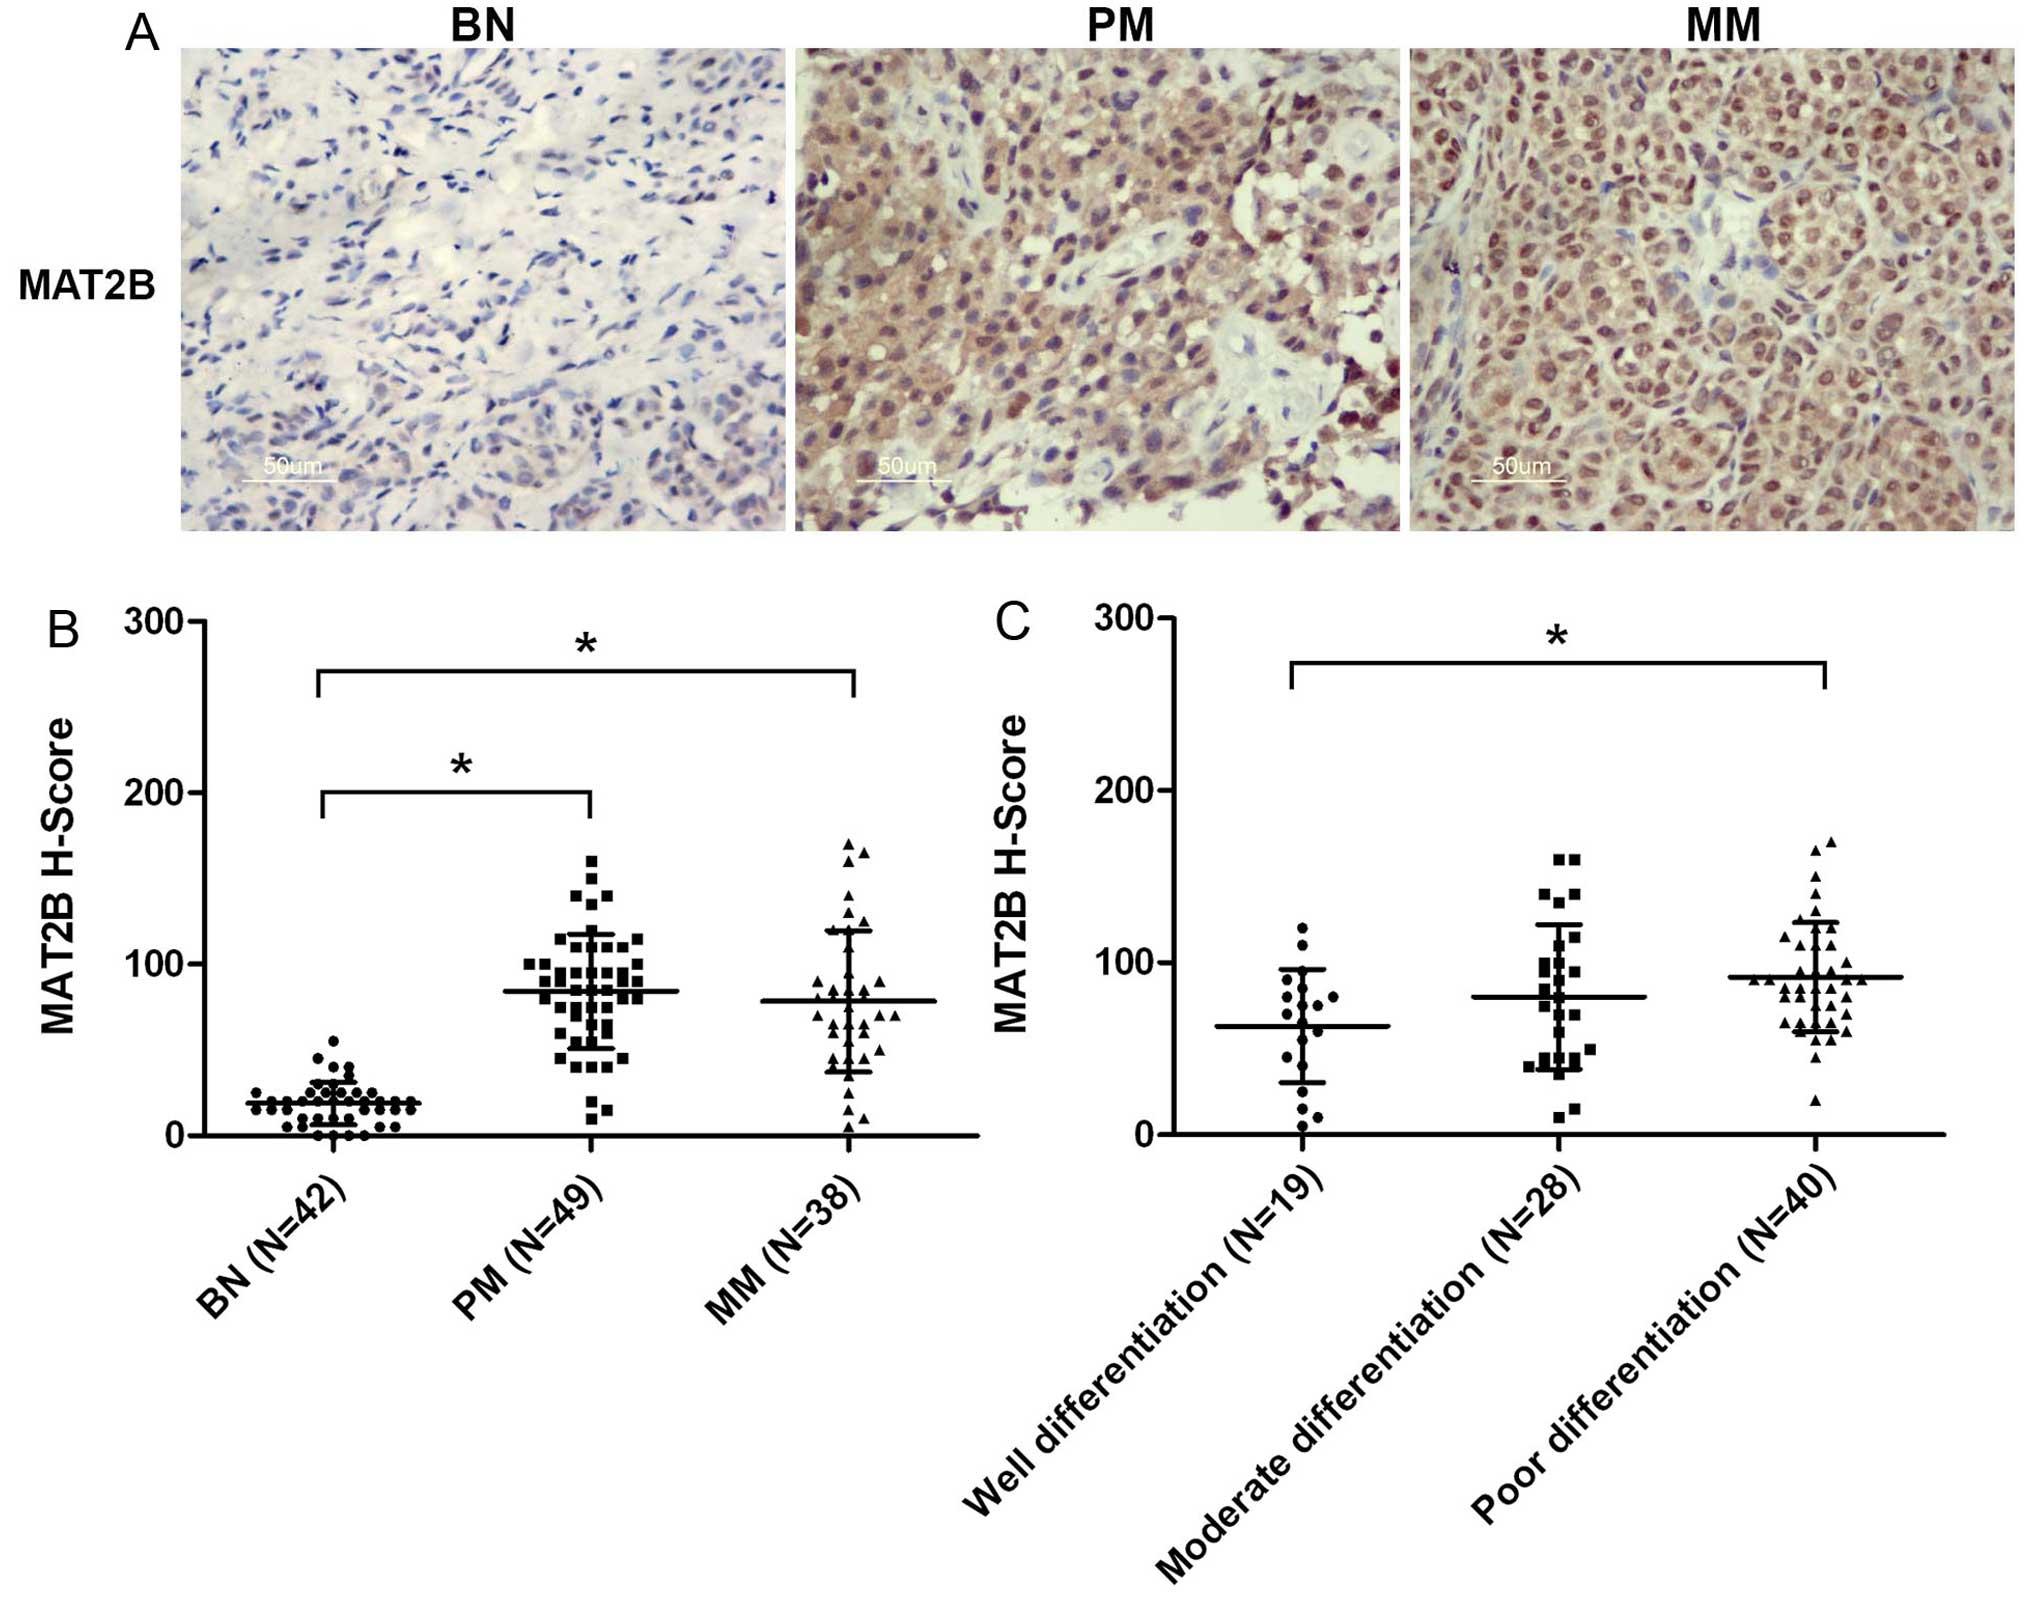 Lentivirus-mediated downregulation of MAT2B inhibits cell